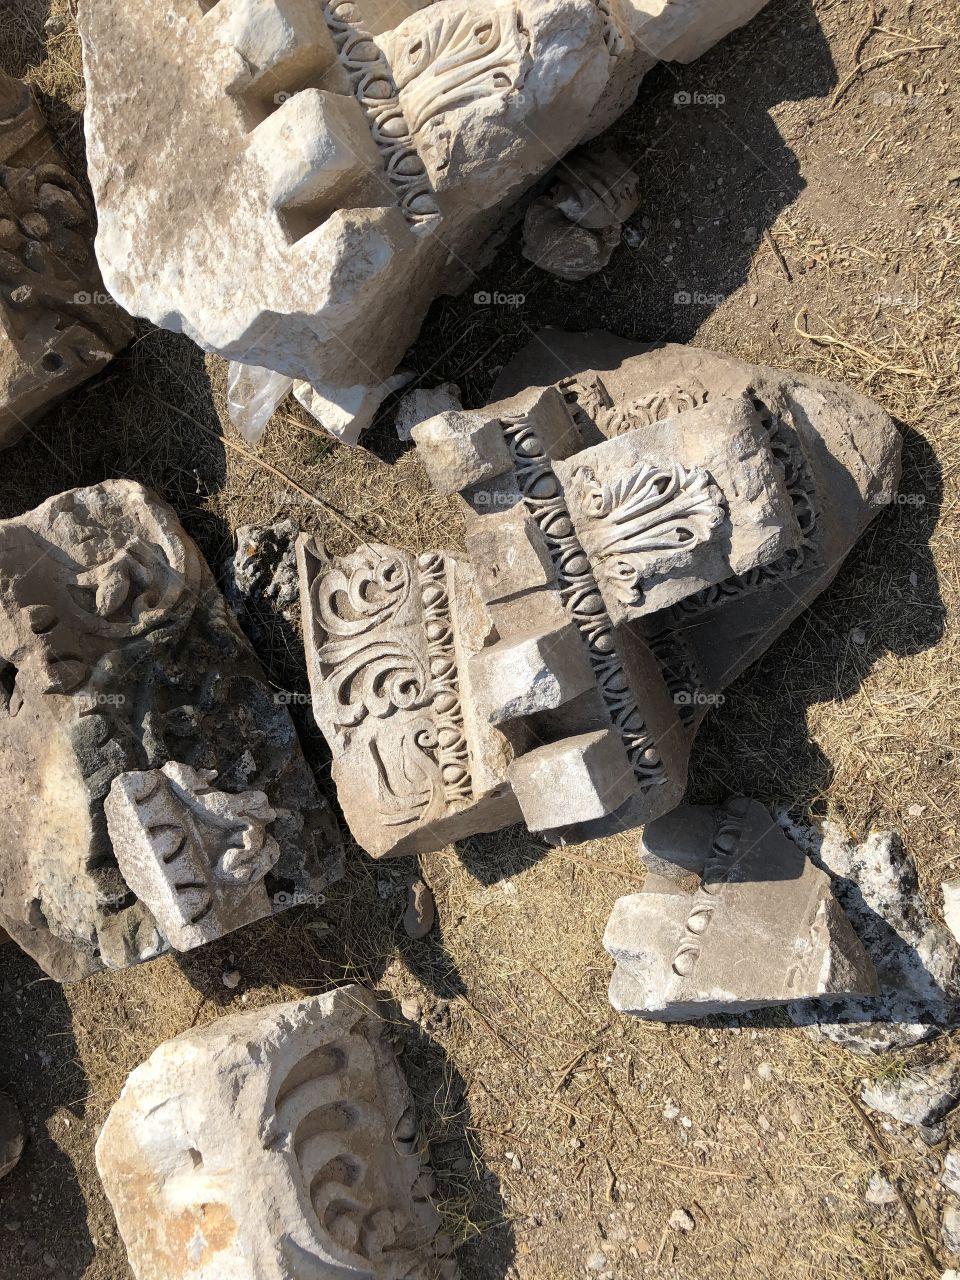 (Blandus ancient city) ancient period decorations and columns